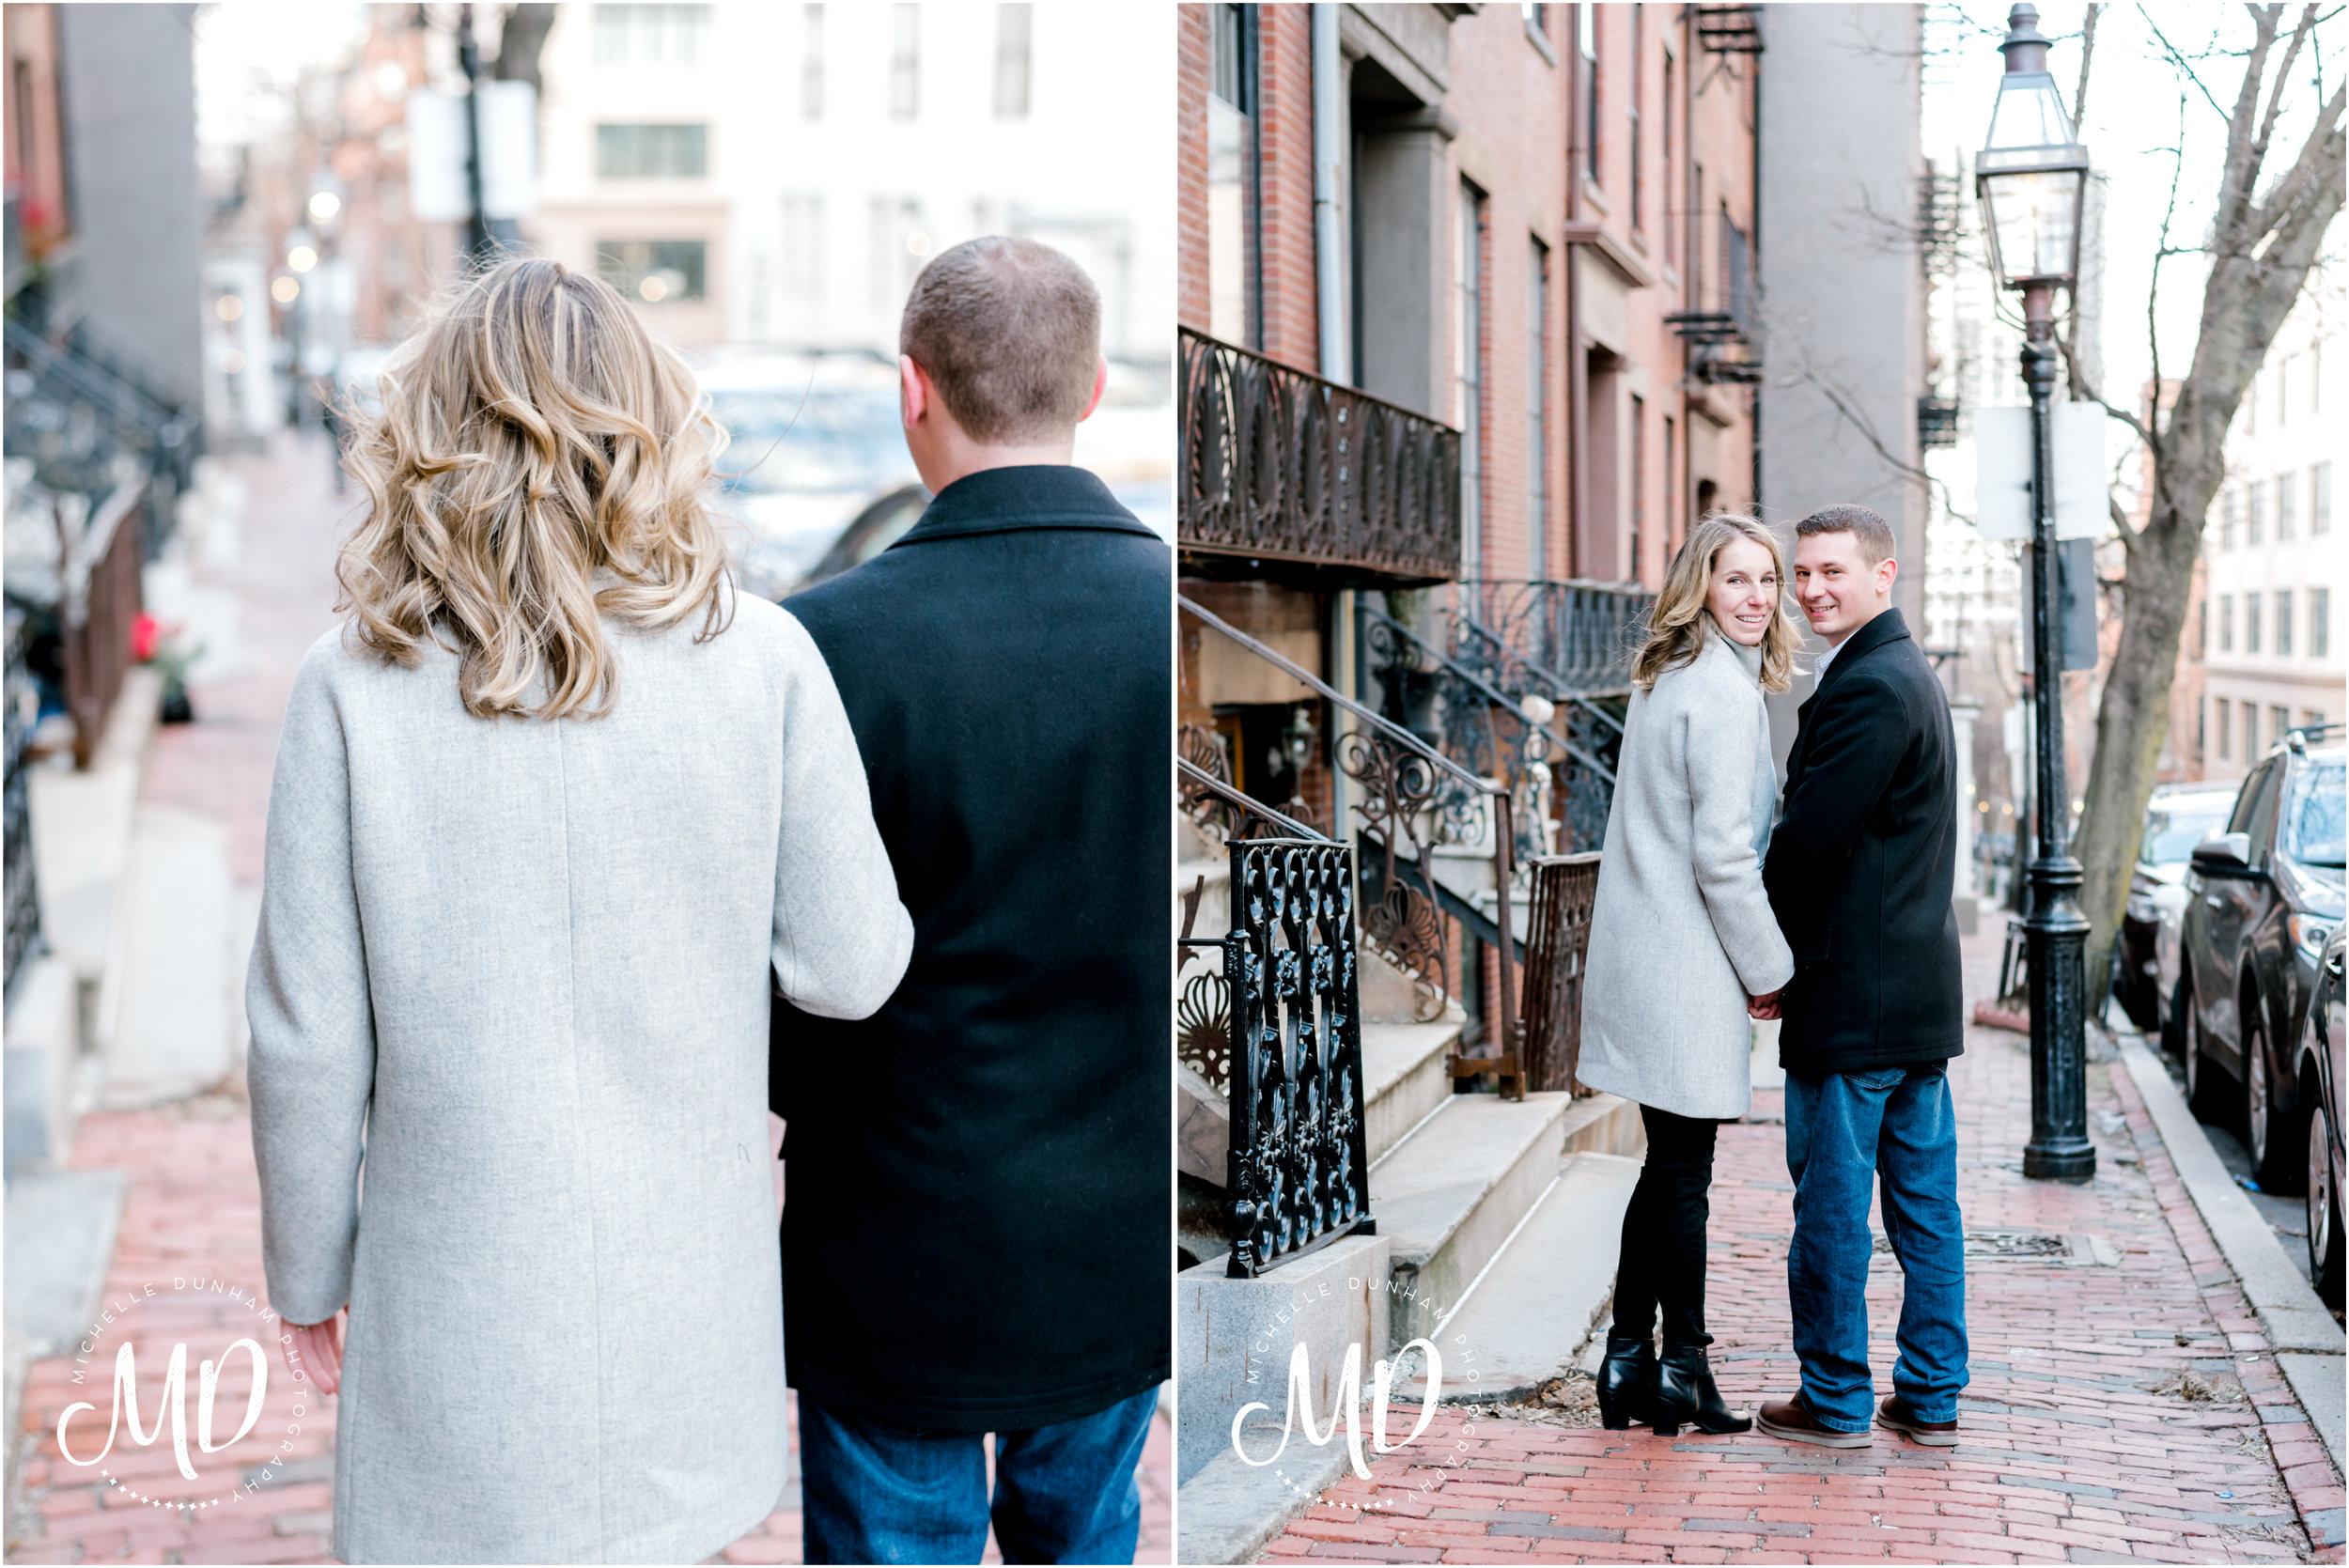 Michelle-Dunham-Photography-Beacon-Hill-Engagement-24.jpg